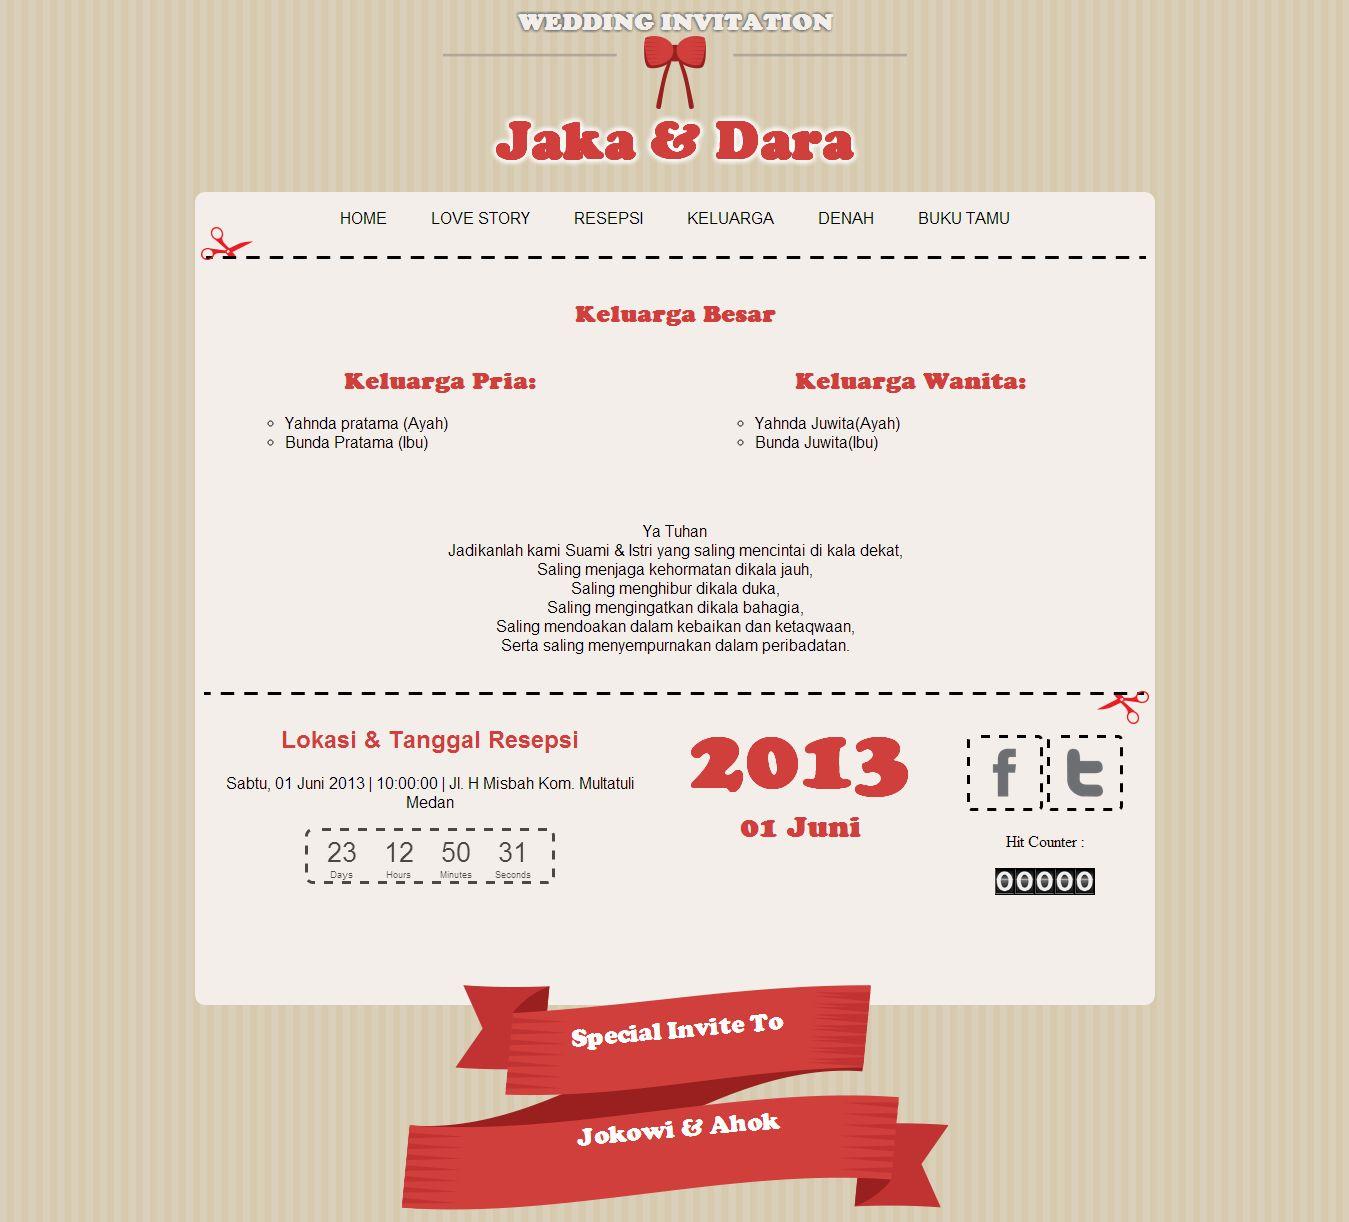 Undangan pernikahan online theme undangan pernikahan online